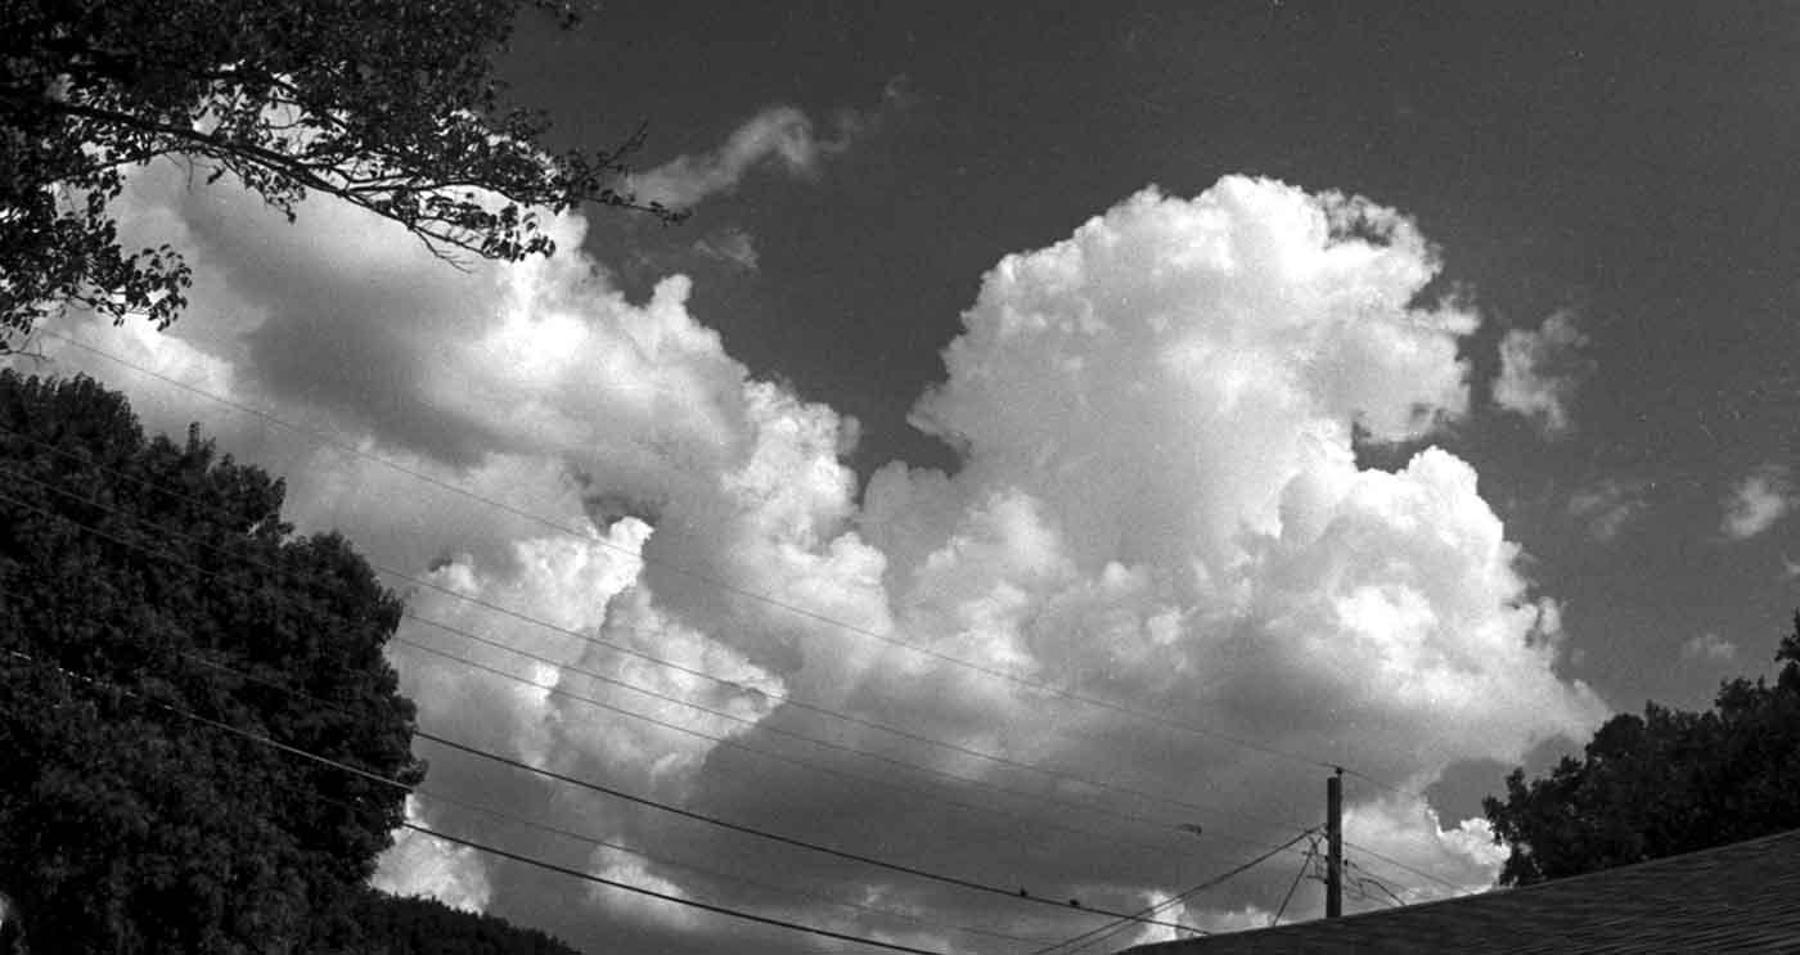 Clouds, Waco, Texas